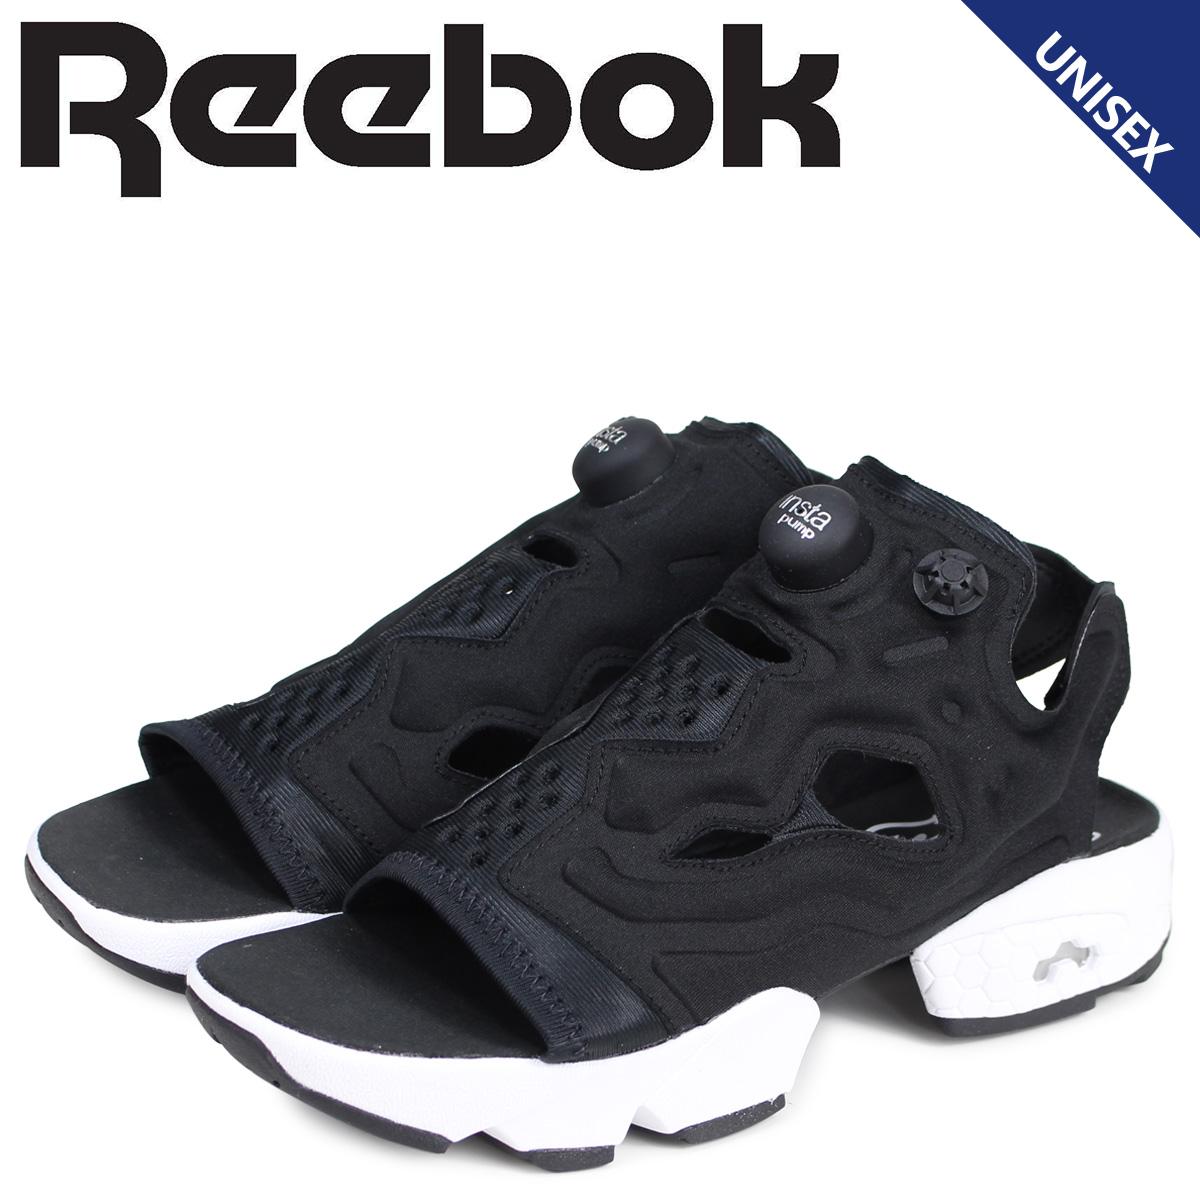 Reebok リーボック インスタ ポンプフューリー サンダル スポーツサンダル メンズ レディース INSTAPUMP FURY SANDAL ブラック 黒 DV9699